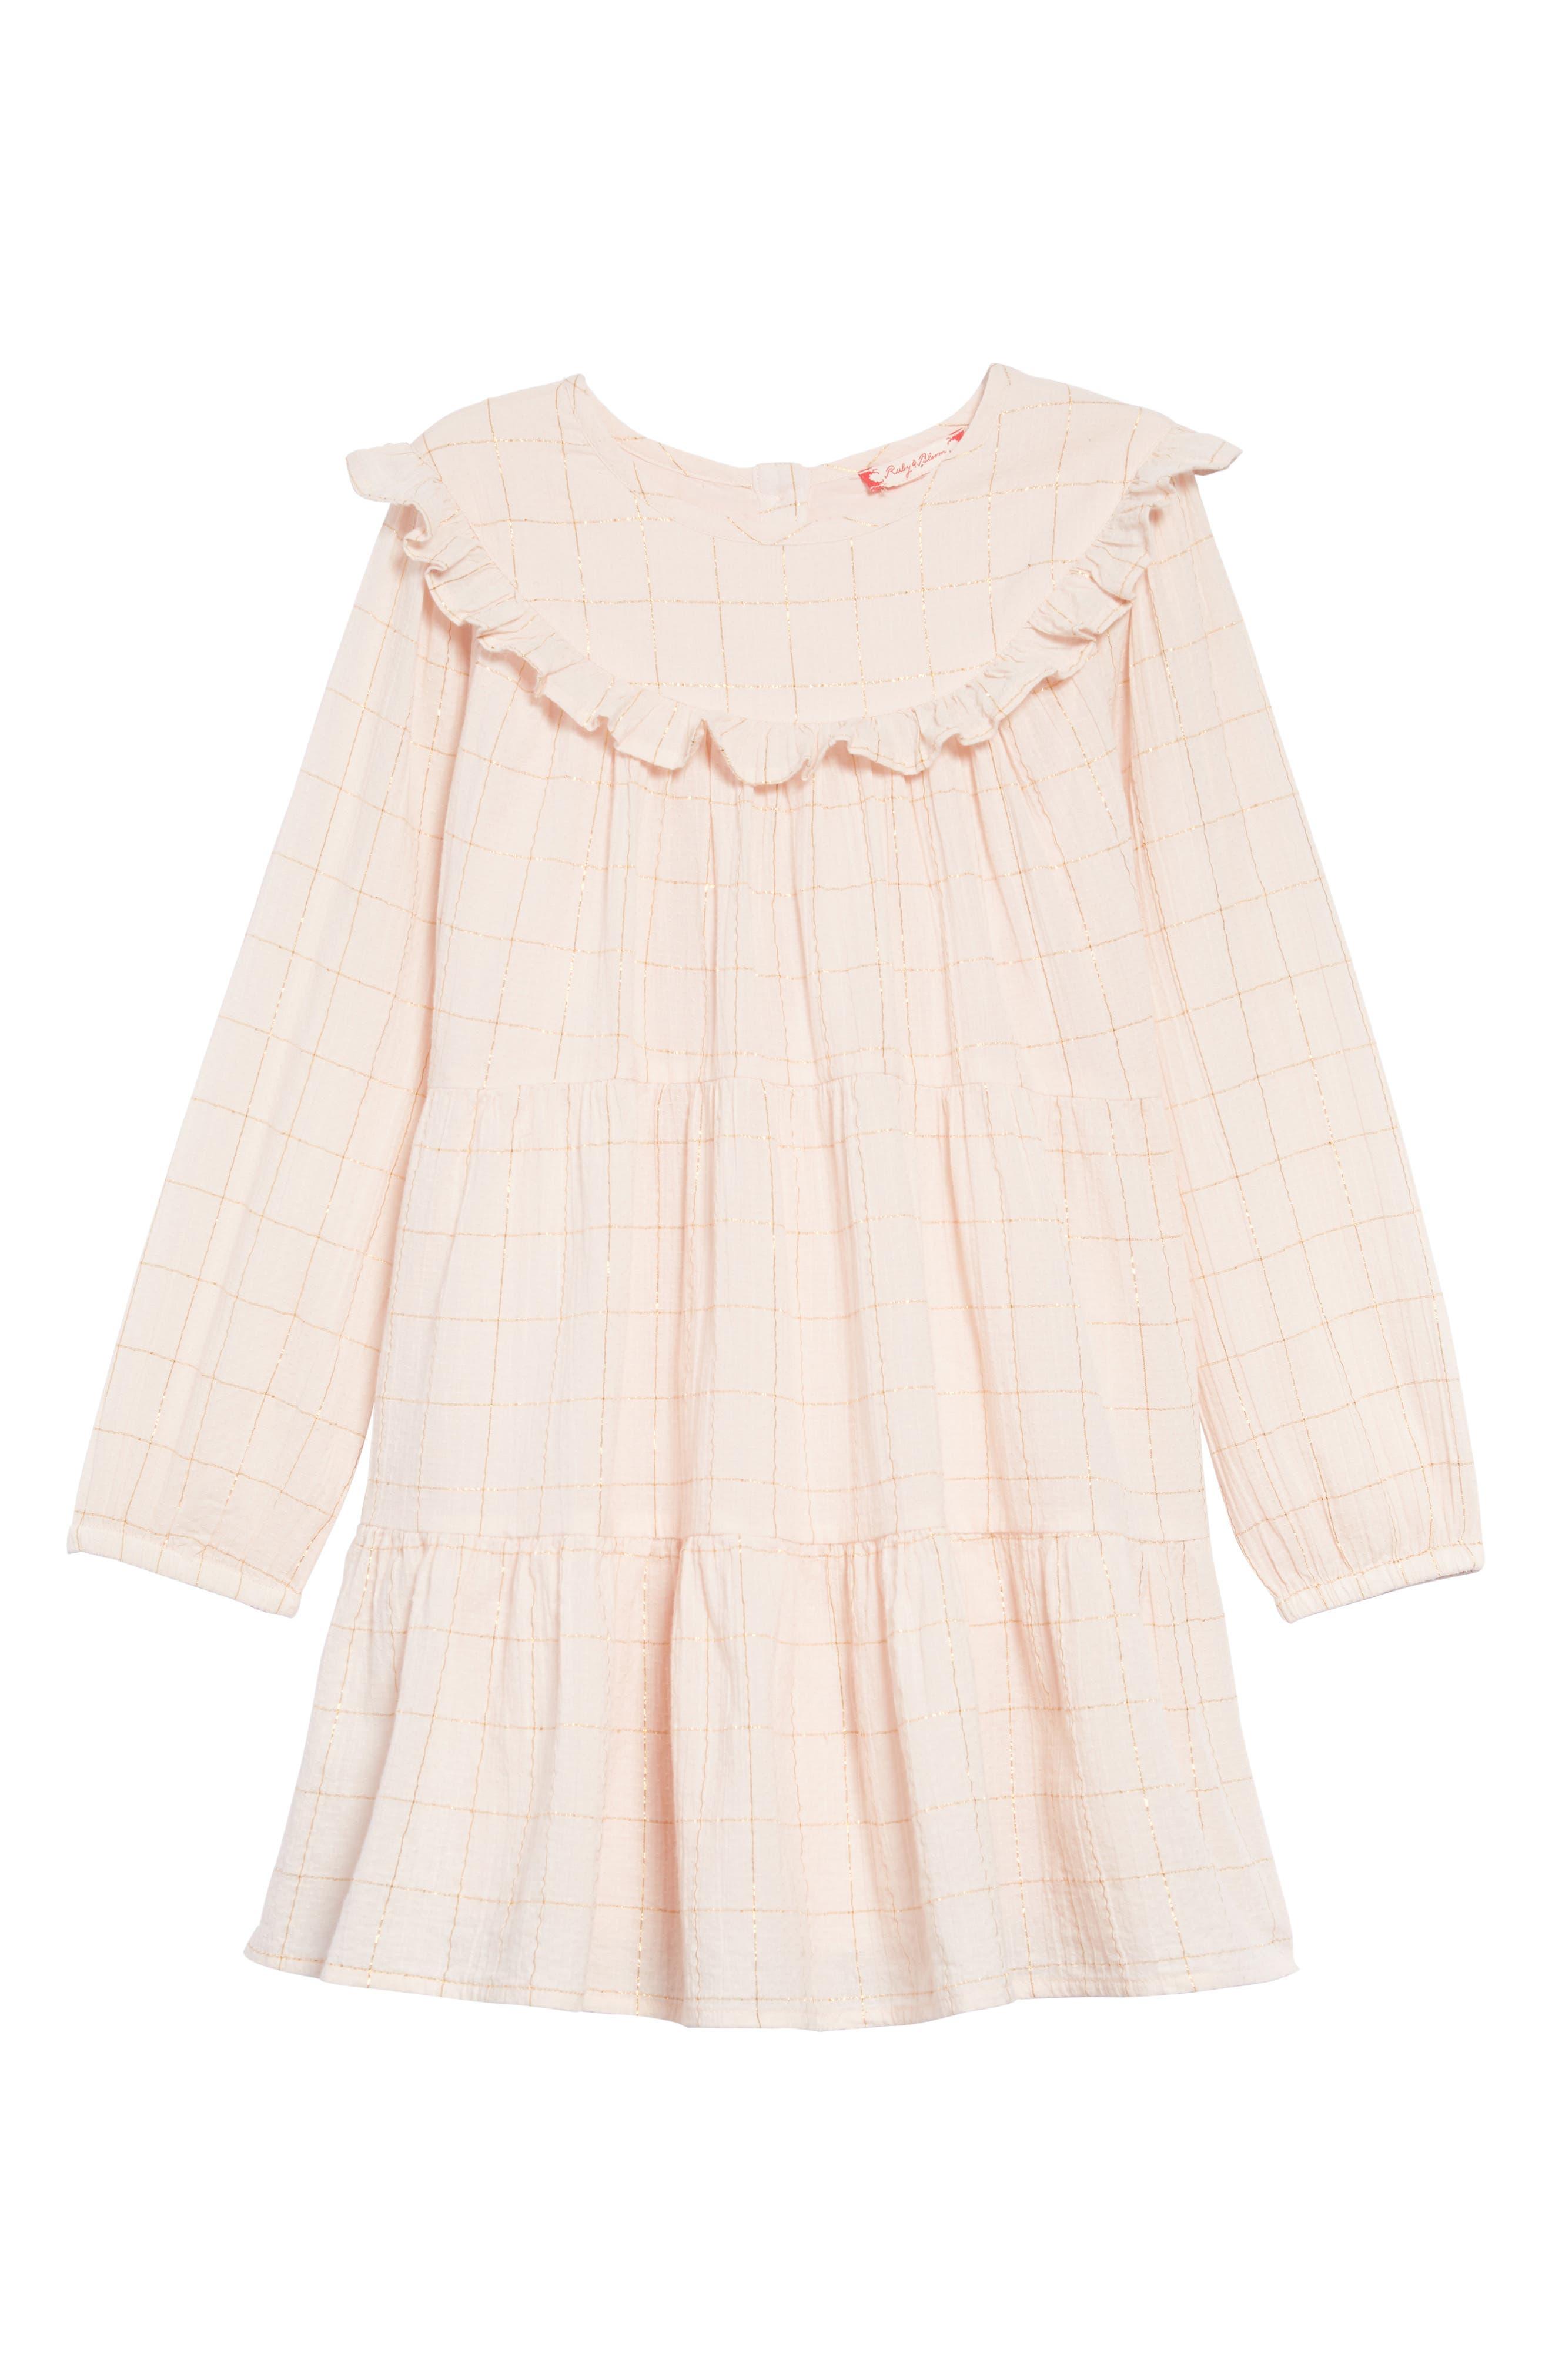 Tiered Dress,                             Main thumbnail 1, color,                             PINK WOOD- GOLD CHECK